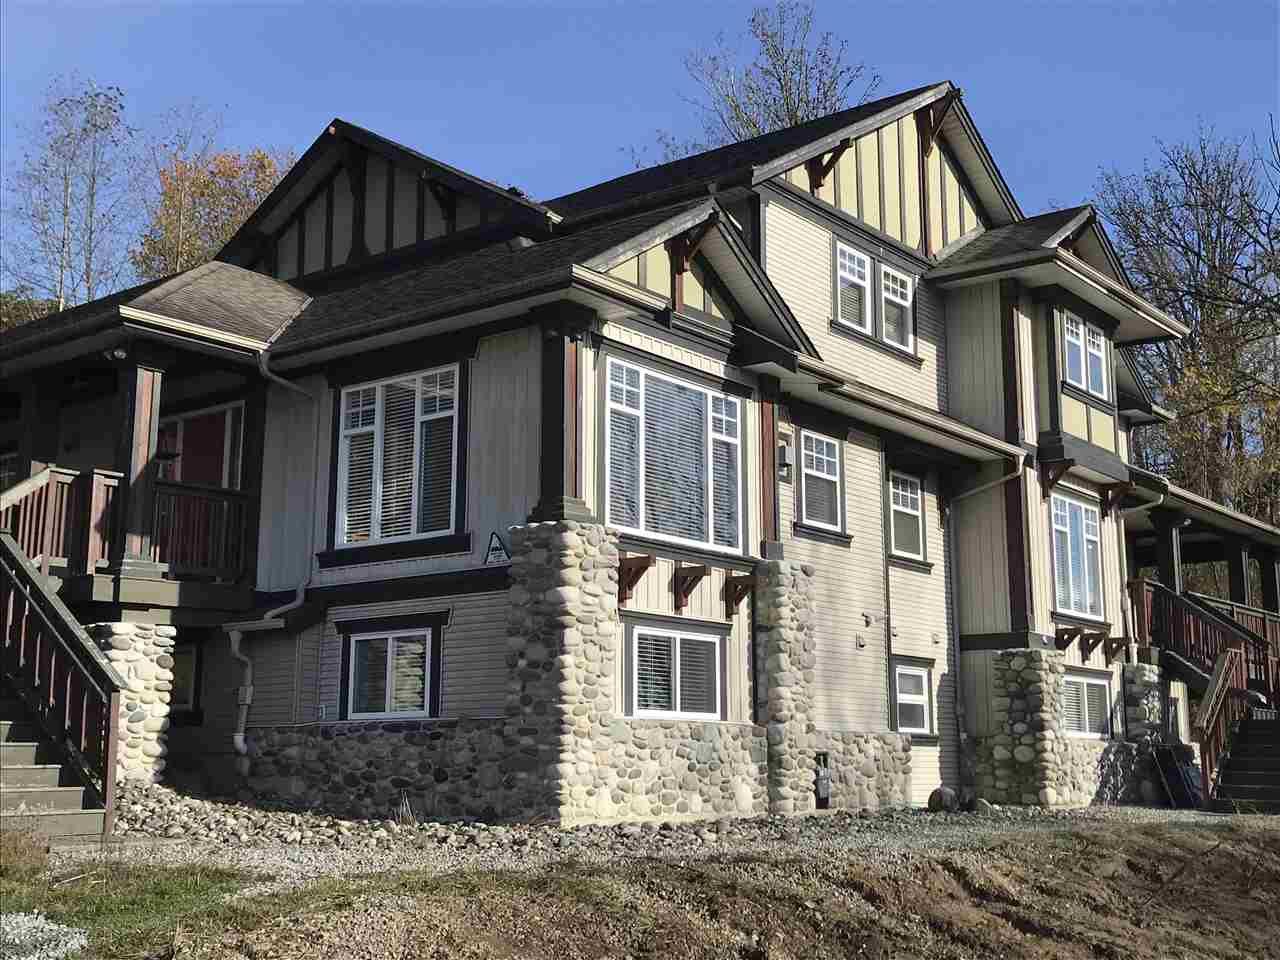 Main Photo: 9790 276 Street in Maple Ridge: Whonnock House for sale : MLS®# R2325430